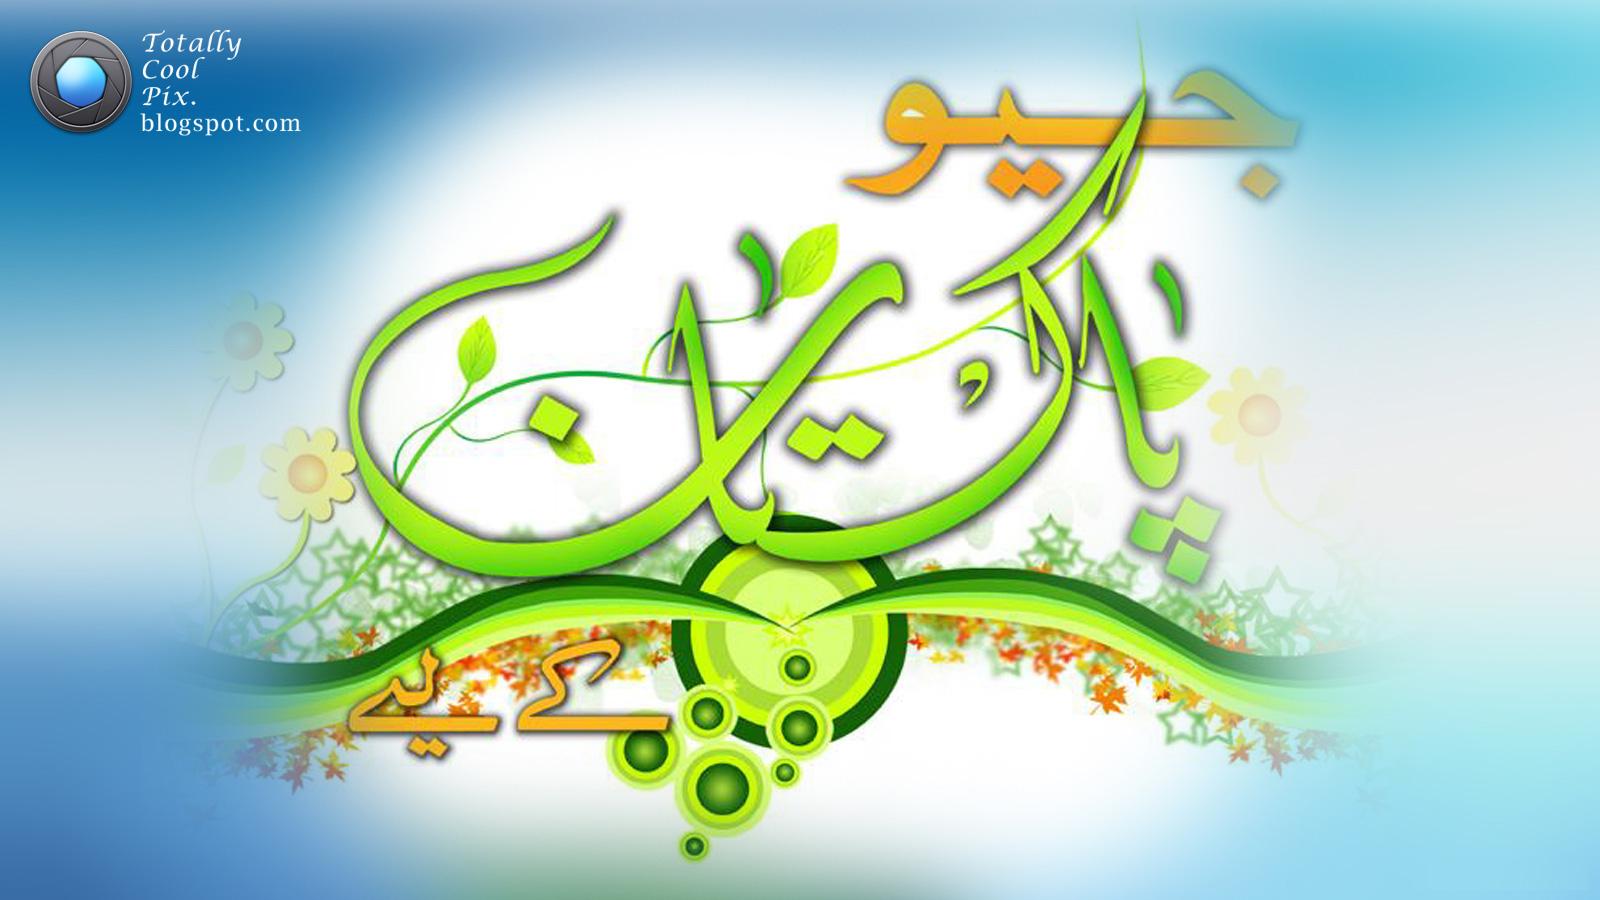 http://3.bp.blogspot.com/-OvGGiH0j8CA/UB3i0su9QII/AAAAAAAACR4/QO_AXmLNssQ/s1600/14-August-independence-day-of-Pakistan-HD-wallpaper-and-greeting-card-32-Geo-pakistan-abstract-background.jpg